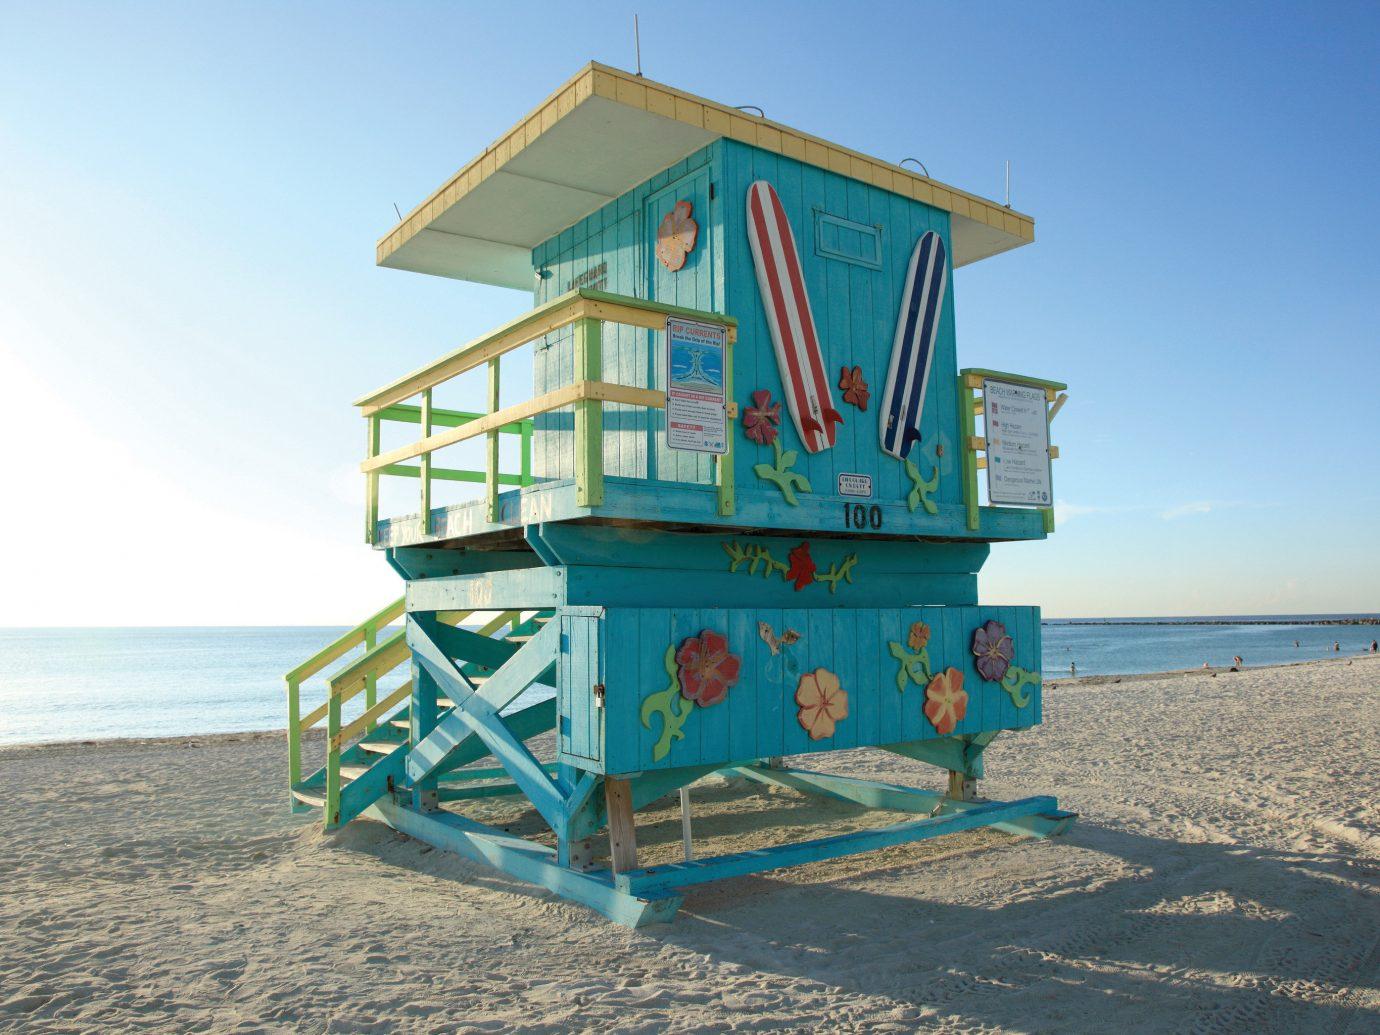 Trip Ideas sky outdoor water Beach ground Ocean vehicle Sea agriculture sand shore sandy